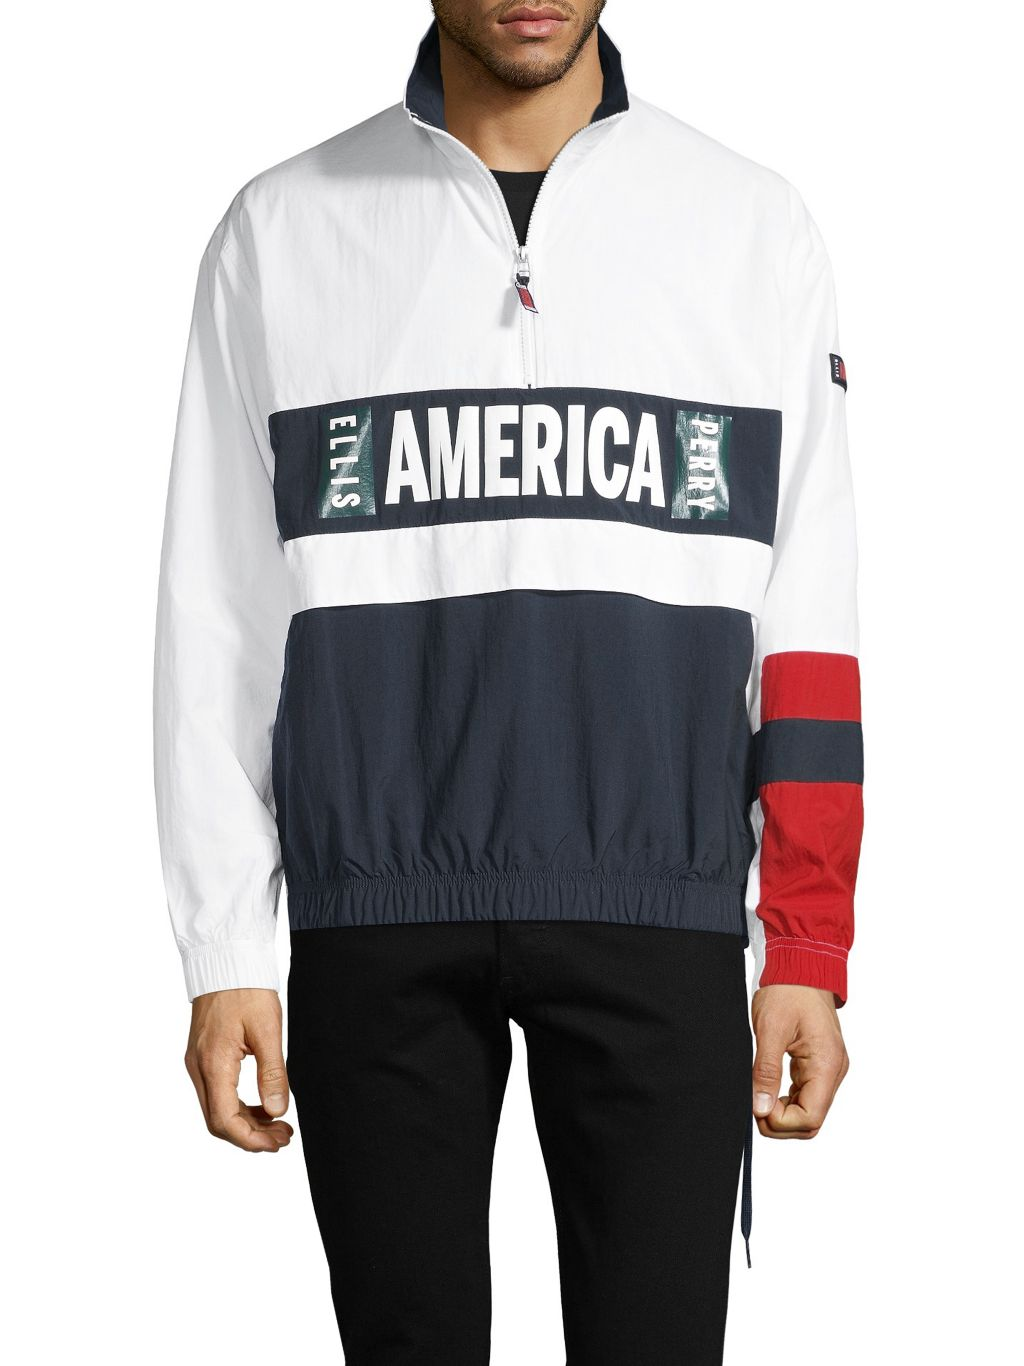 Perry Ellis America Graphic Colorblock Jacket